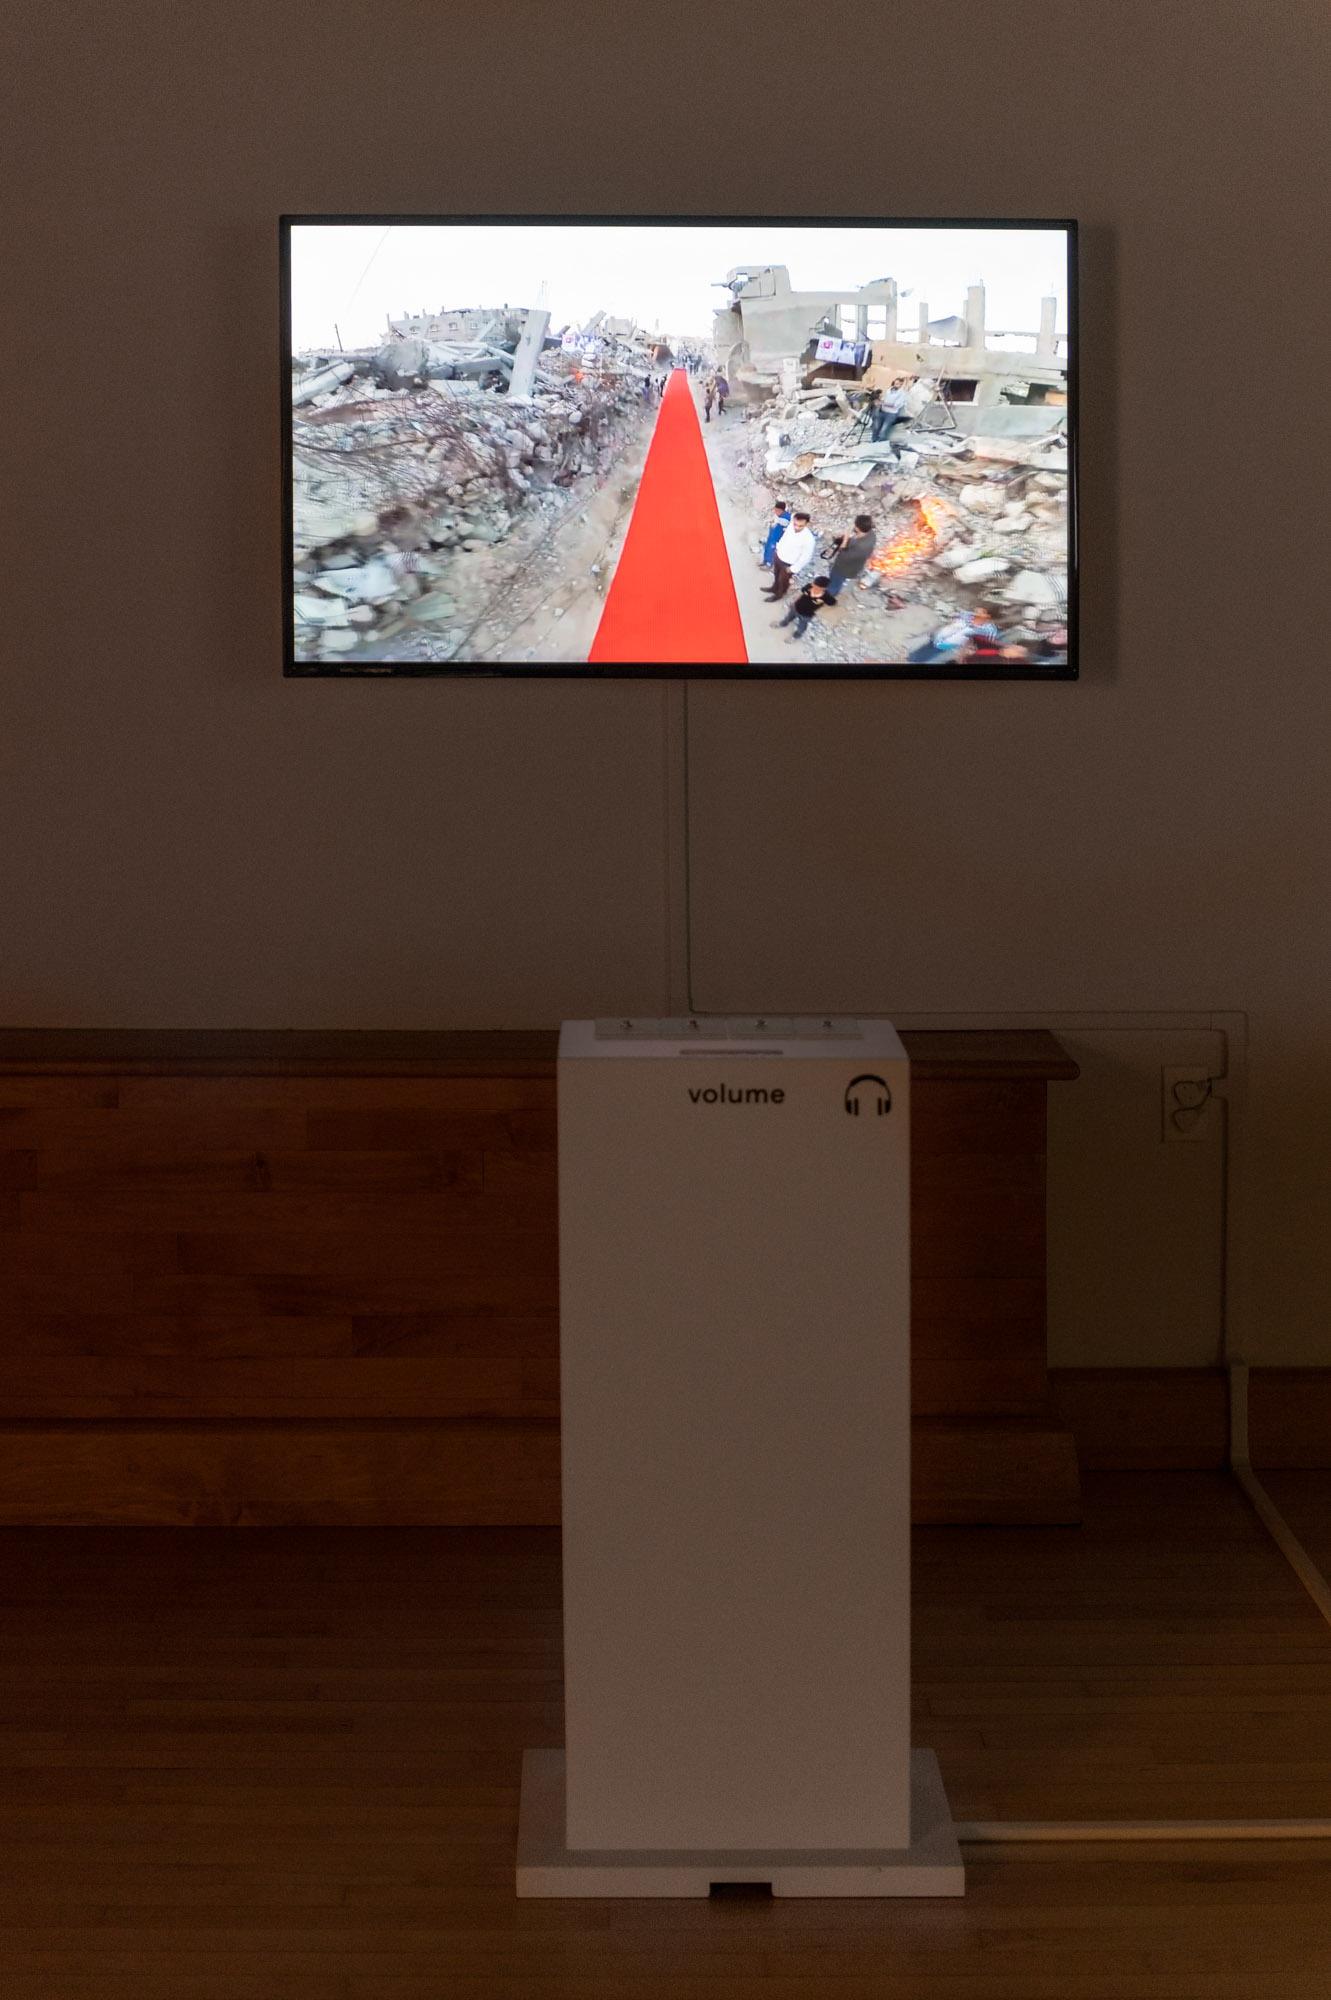 Khalil al-Mozain, Red Carpet Human Rights Film Festival, 2015